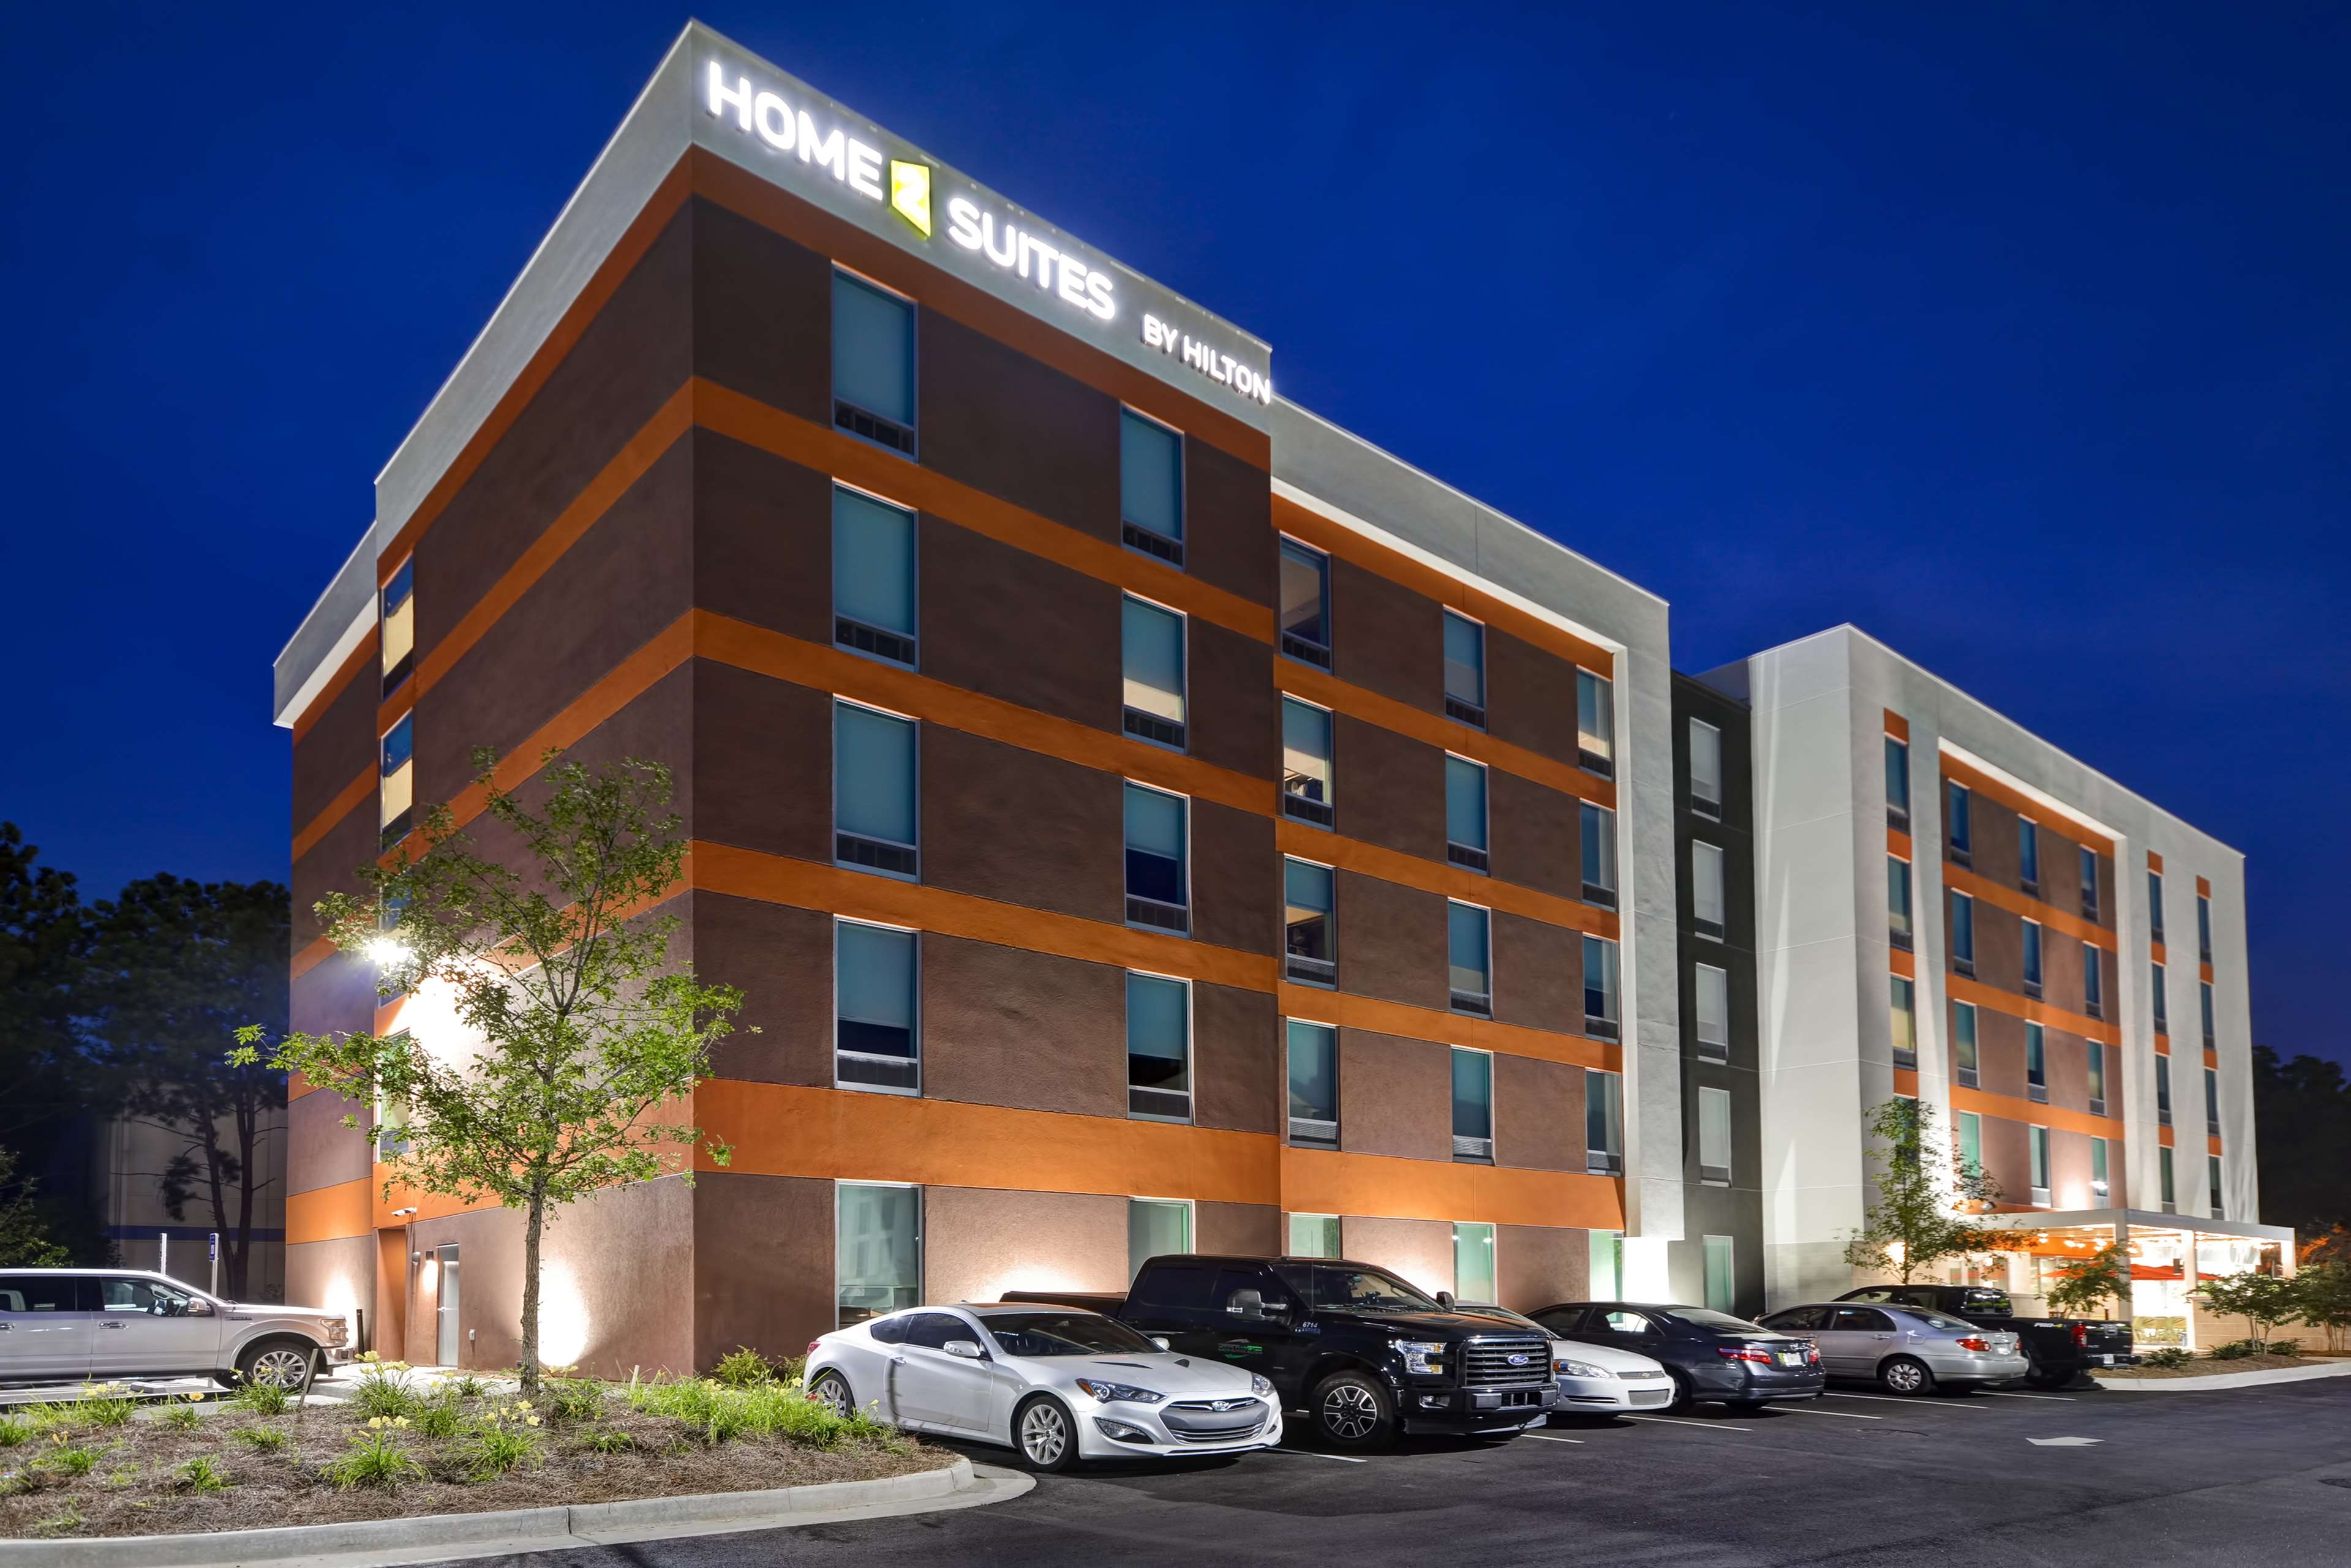 Home2 Suites by Hilton Atlanta West Lithia Springs image 2